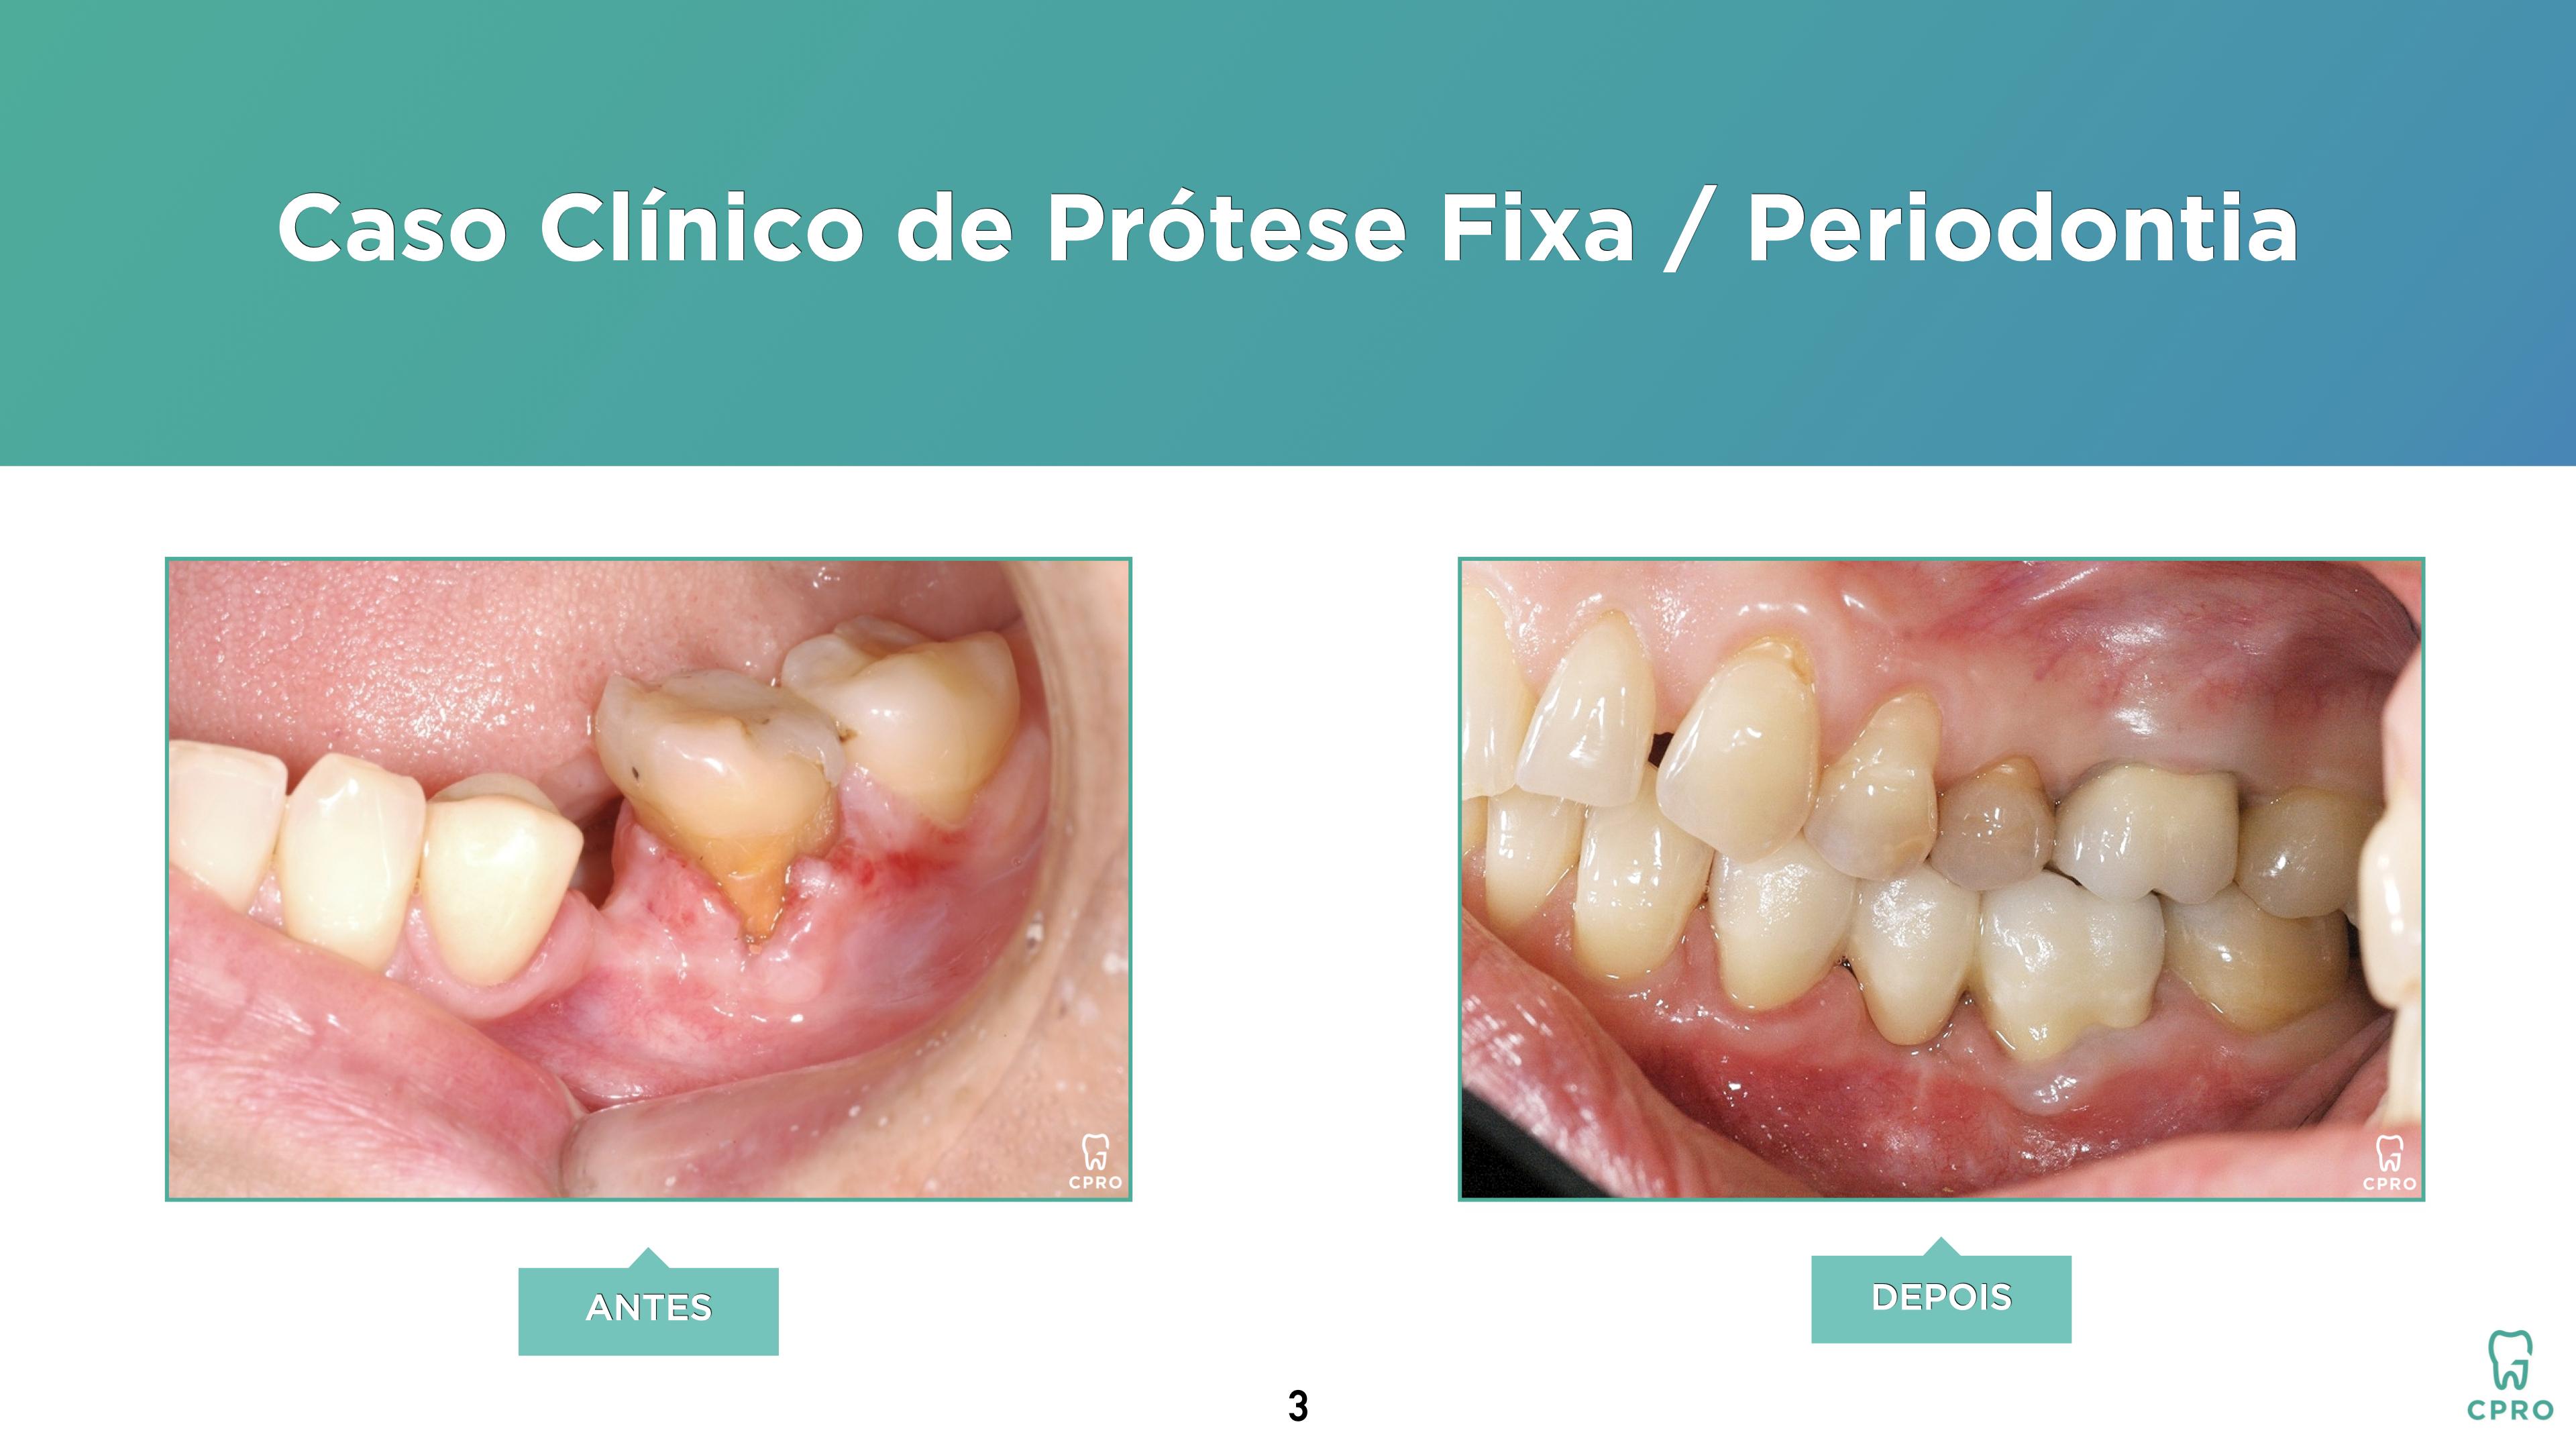 Prótese Fixa | Periodontia